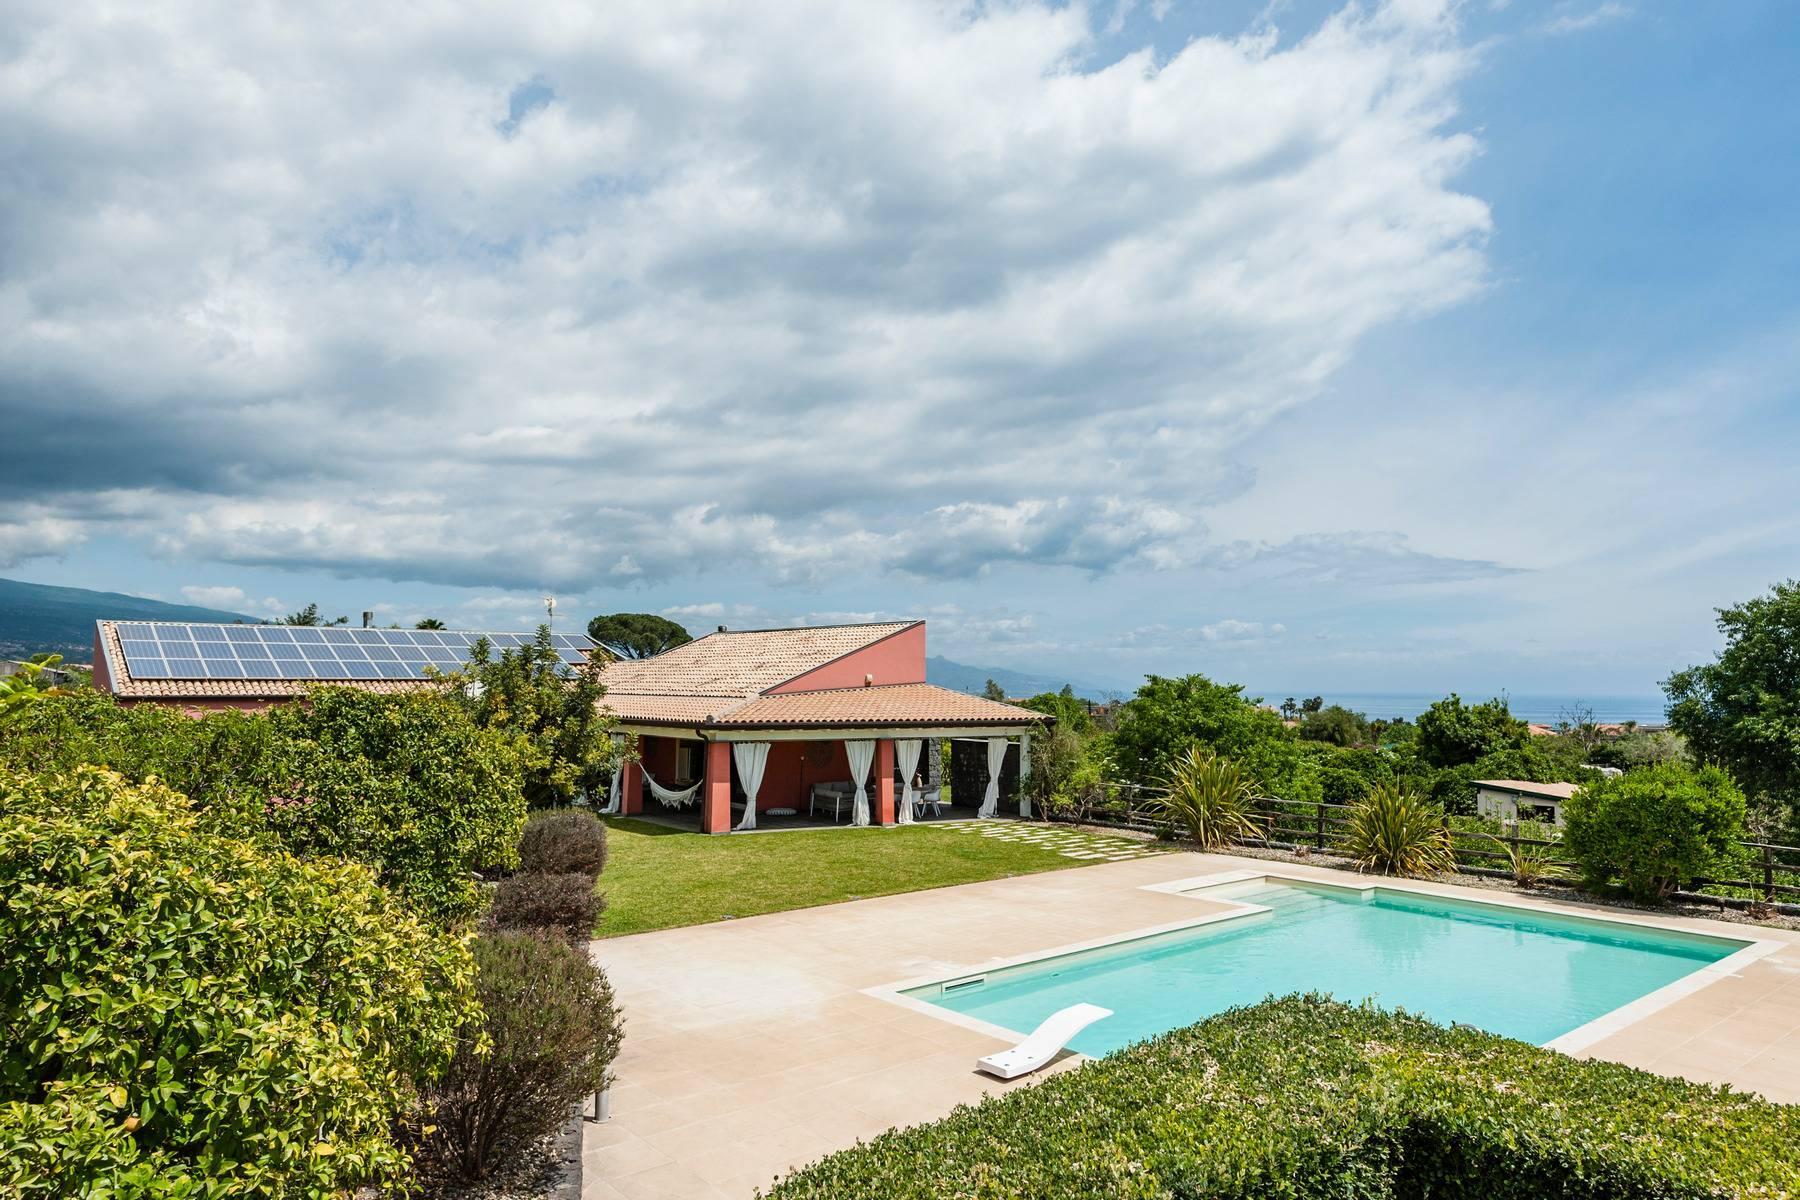 Villa esclusiva con piscina con vista ad Acireale - 22